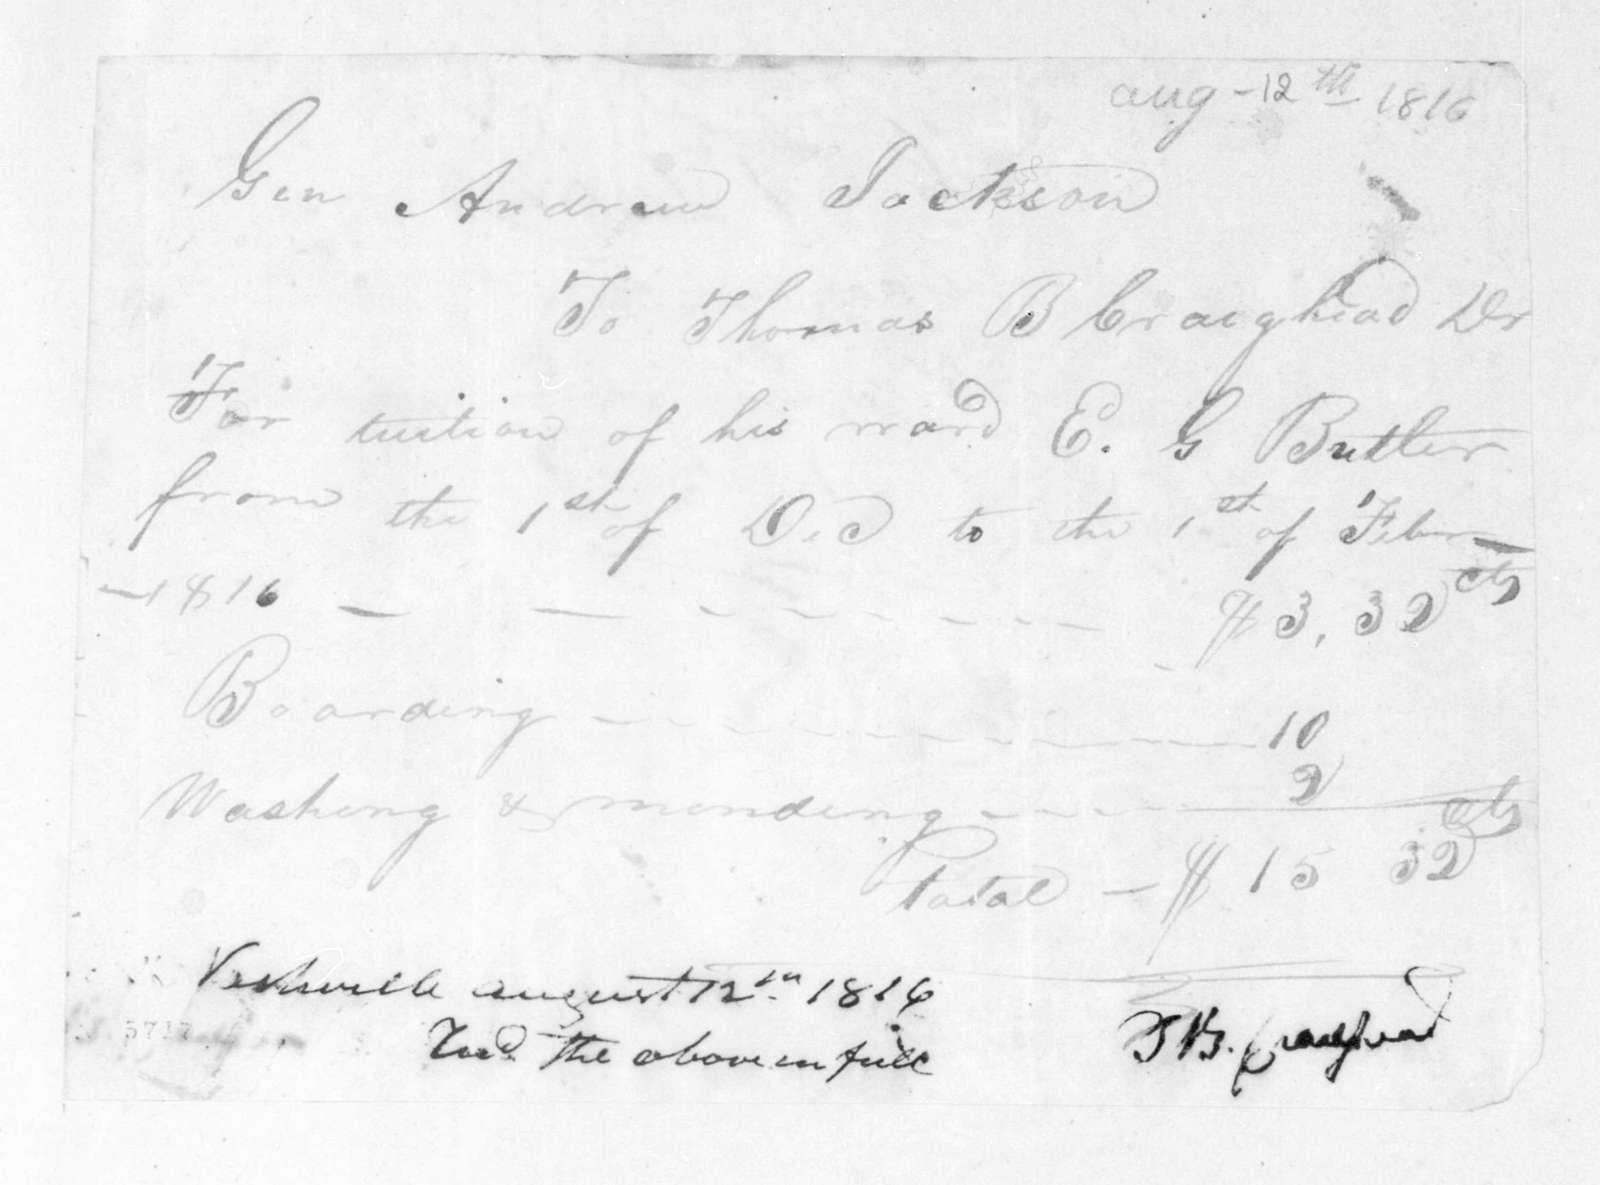 Thomas B. Craighead to Andrew Jackson, August 12, 1816